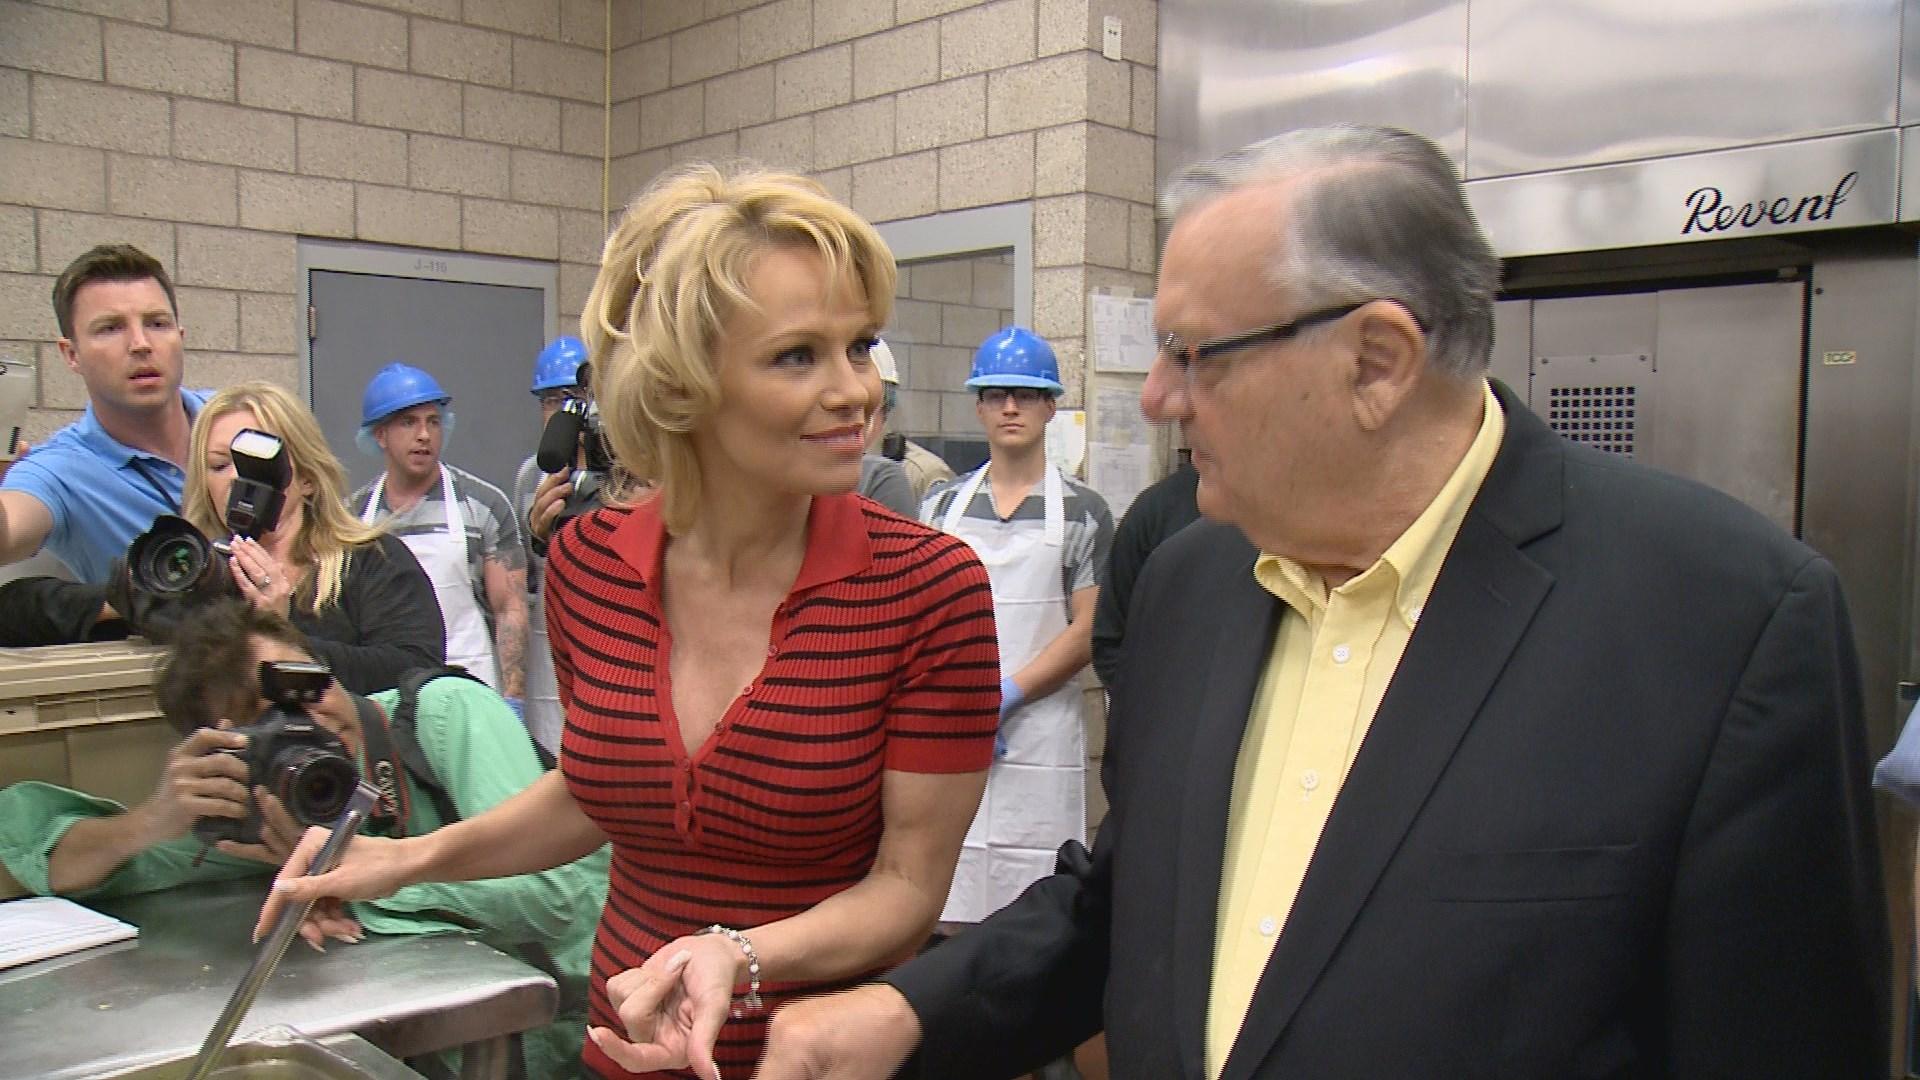 Pamela Anderson visits Maricopa County Jail promotes